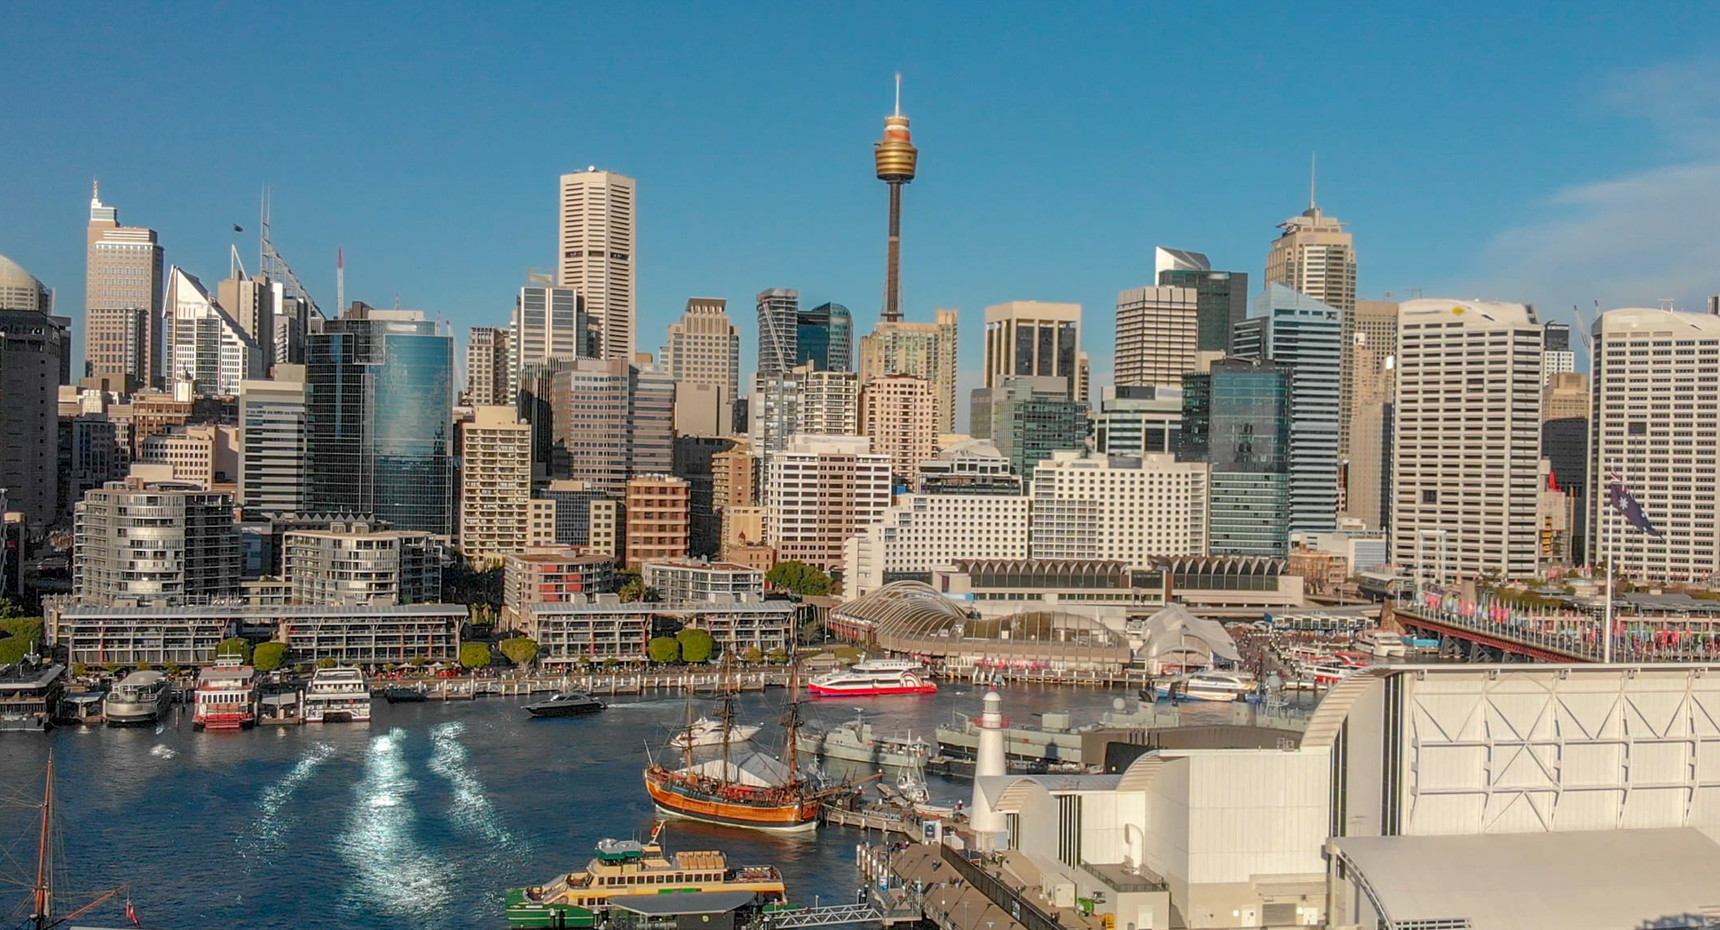 Darling Harbour skyline aerial view